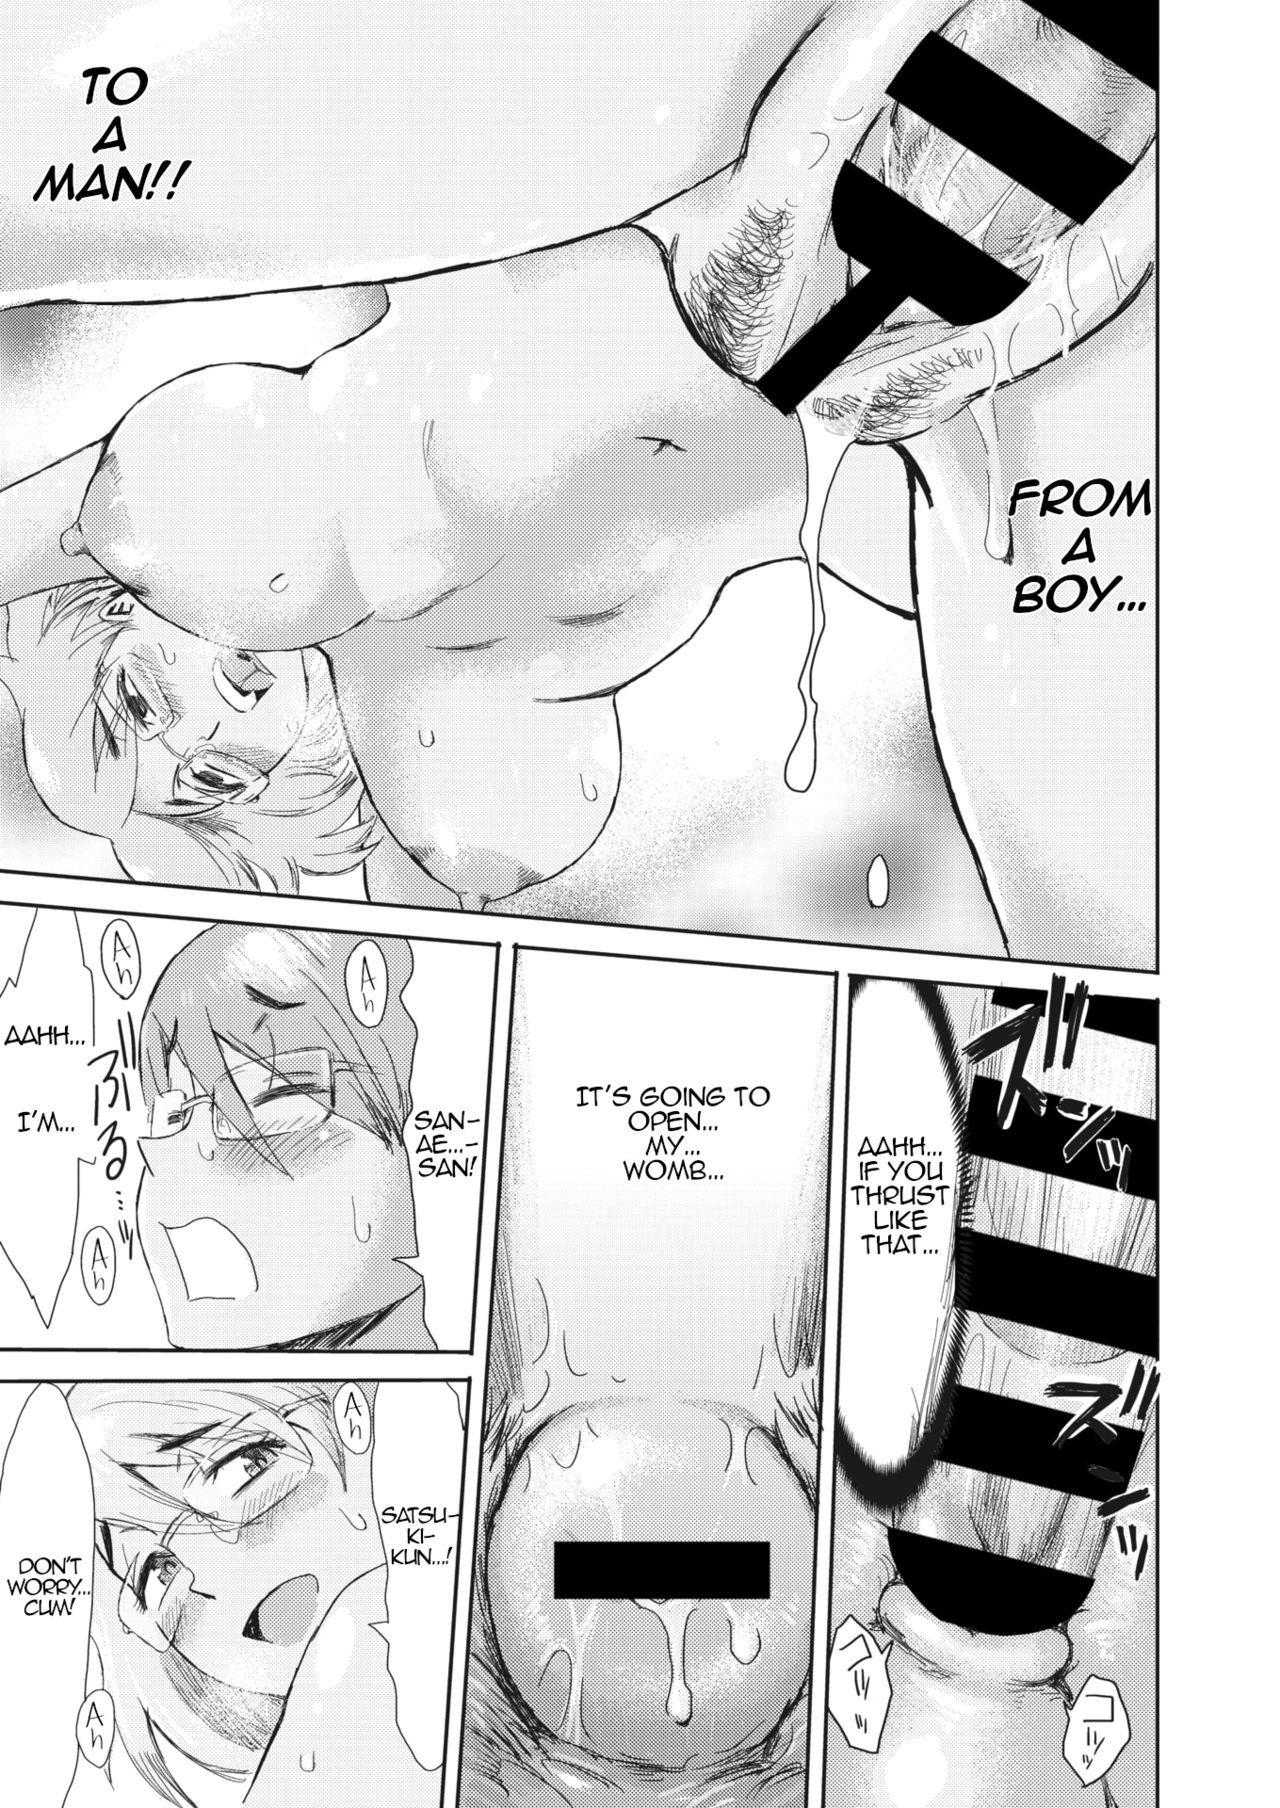 [Kuroiwa Menou] Hitozuma to Shounen Hirusagari no Yuuwaku | Married Woman and Young Boy, Afternoon Temptation (COMIC HOTMiLK Koime Vol. 22) [English] [Digital] 20